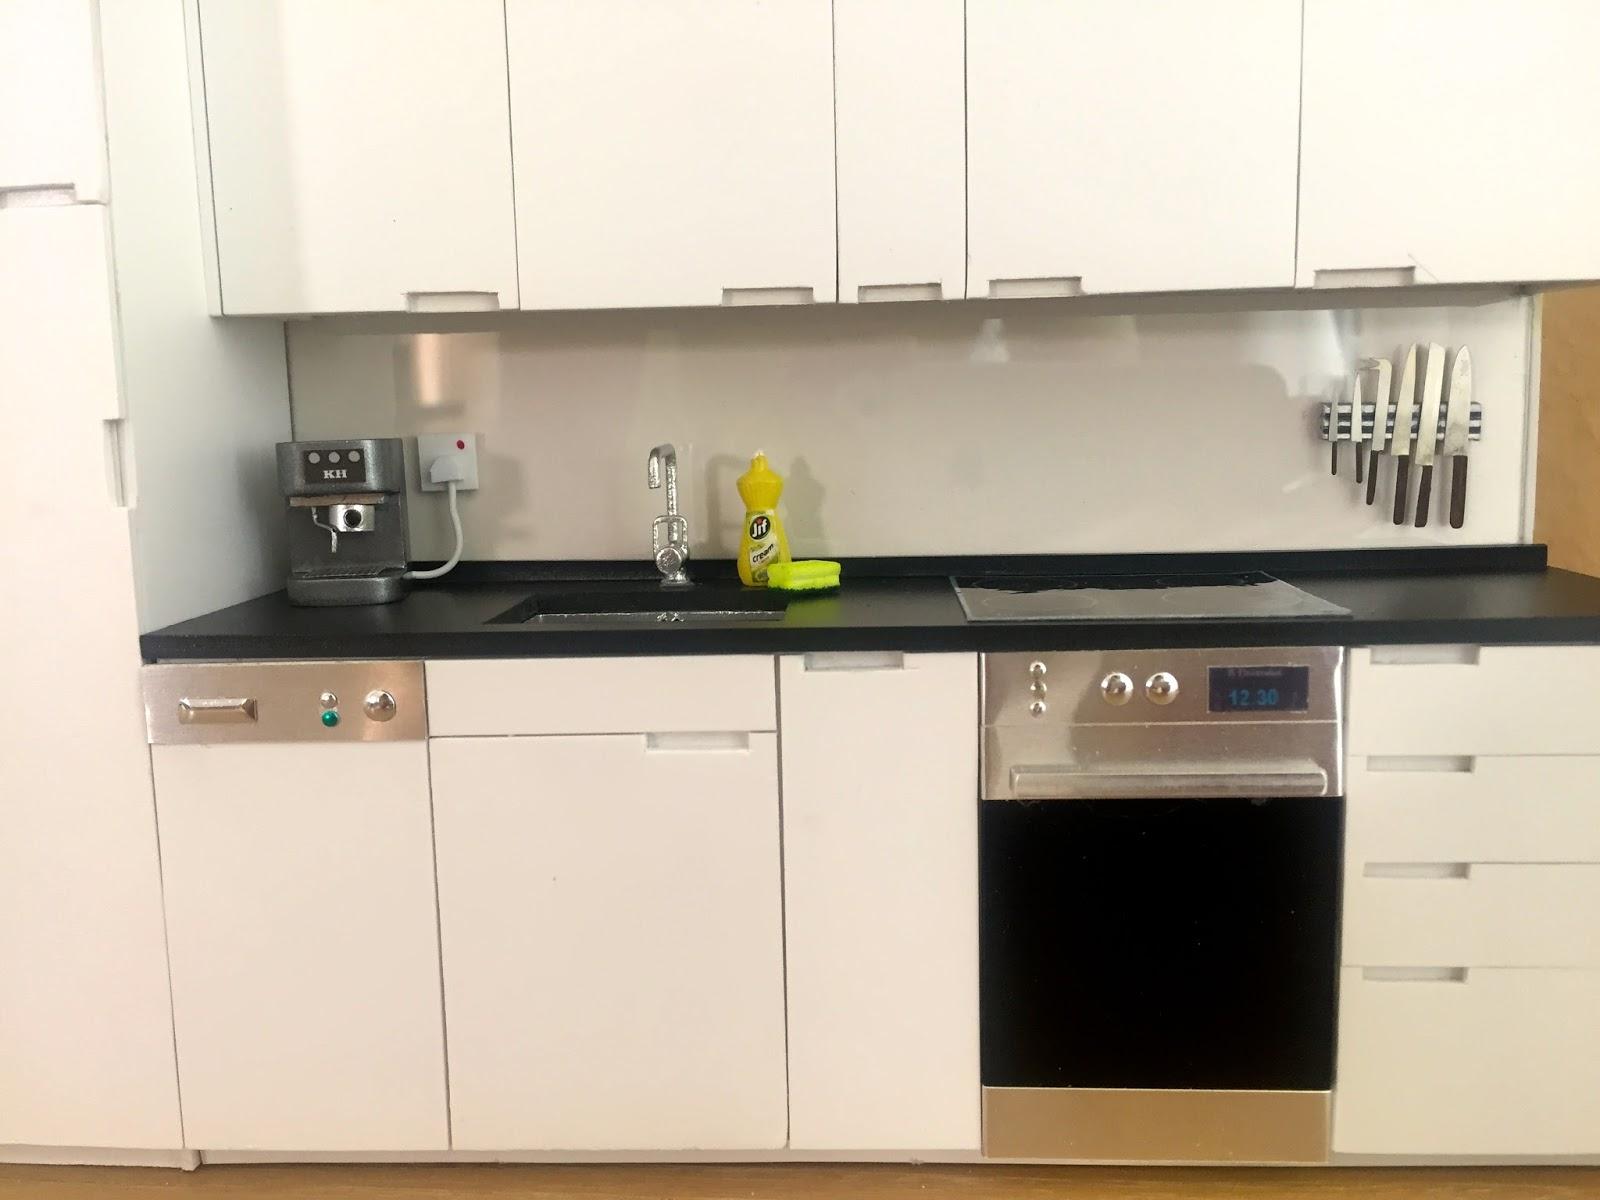 1 12 scale modern model houses kitchen for Model kitchen